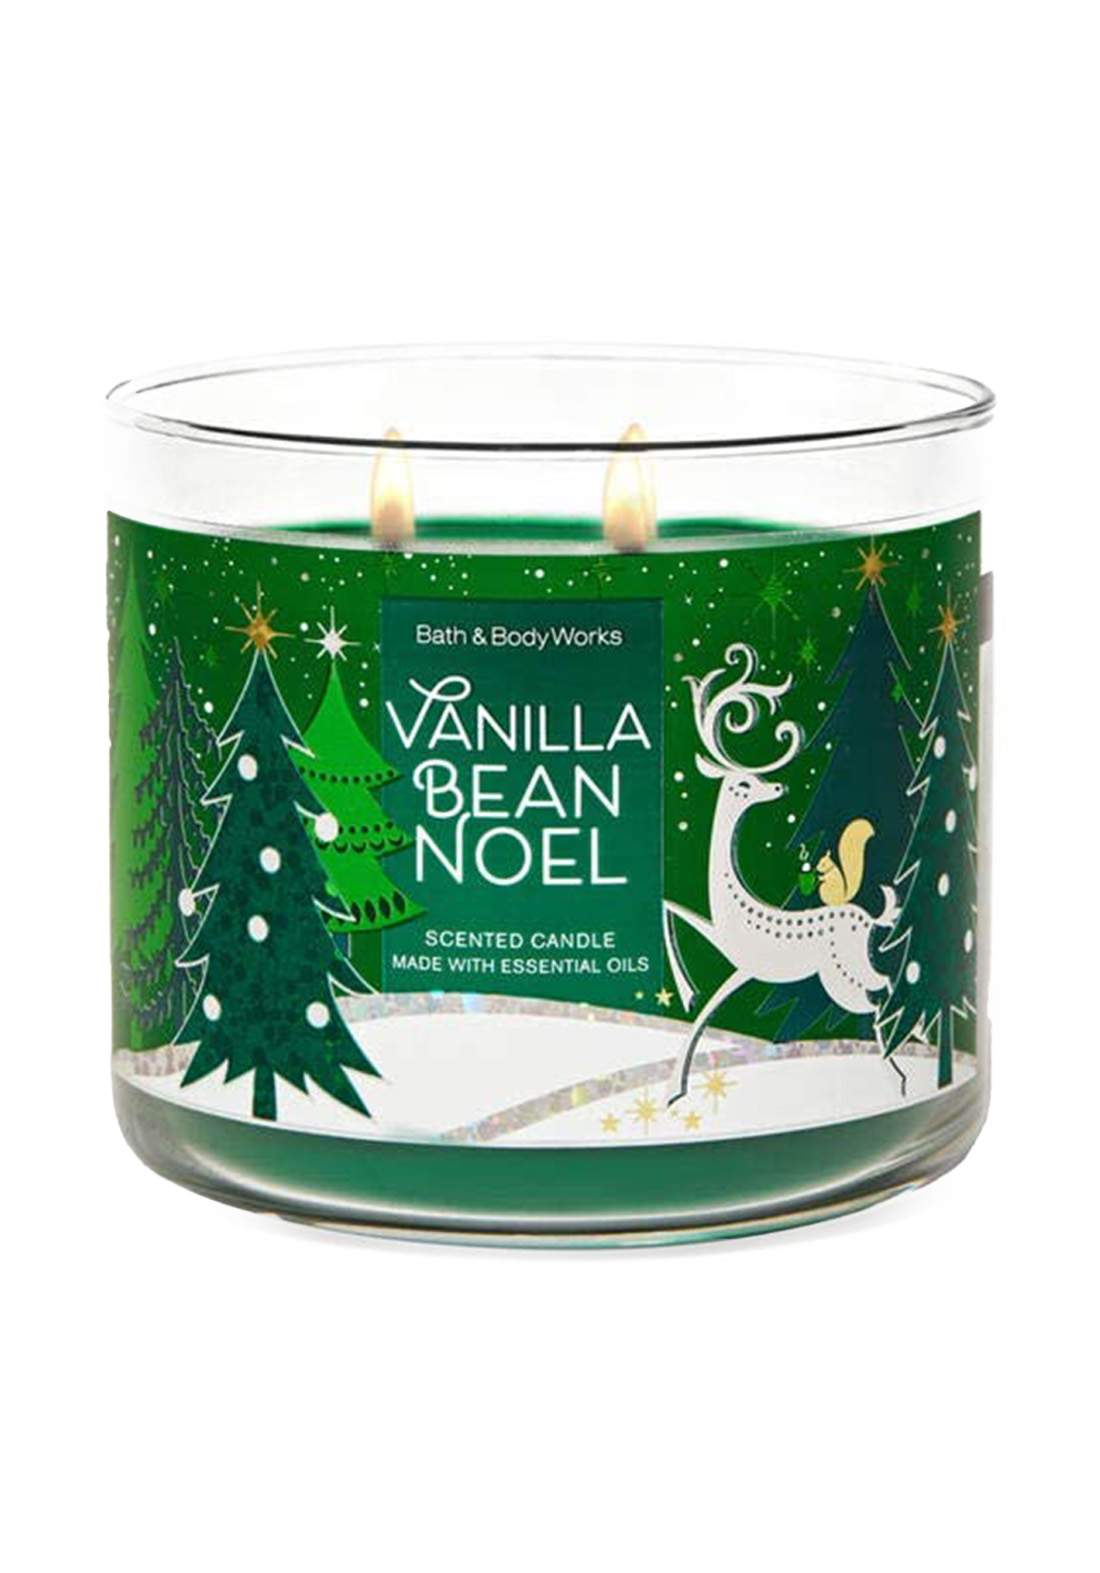 Bath And Body Works Vanlla Bean Nobe 3-Wick Candle 411g  شمعة عطرية